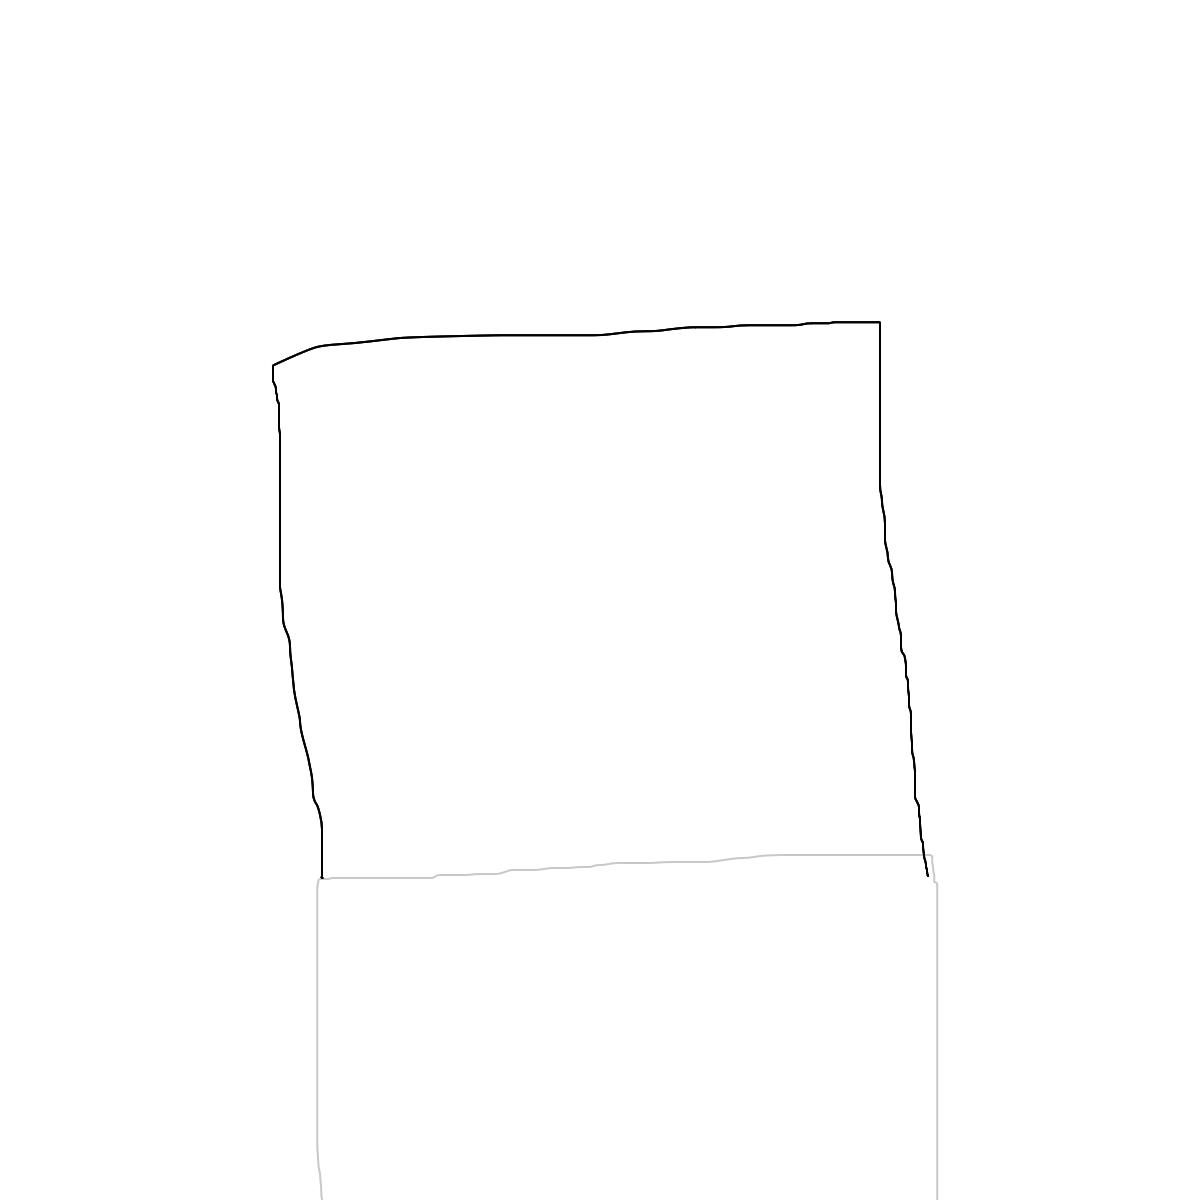 BAAAM drawing#18823 lat:55.7507438659668000lng: 37.6163444519043000